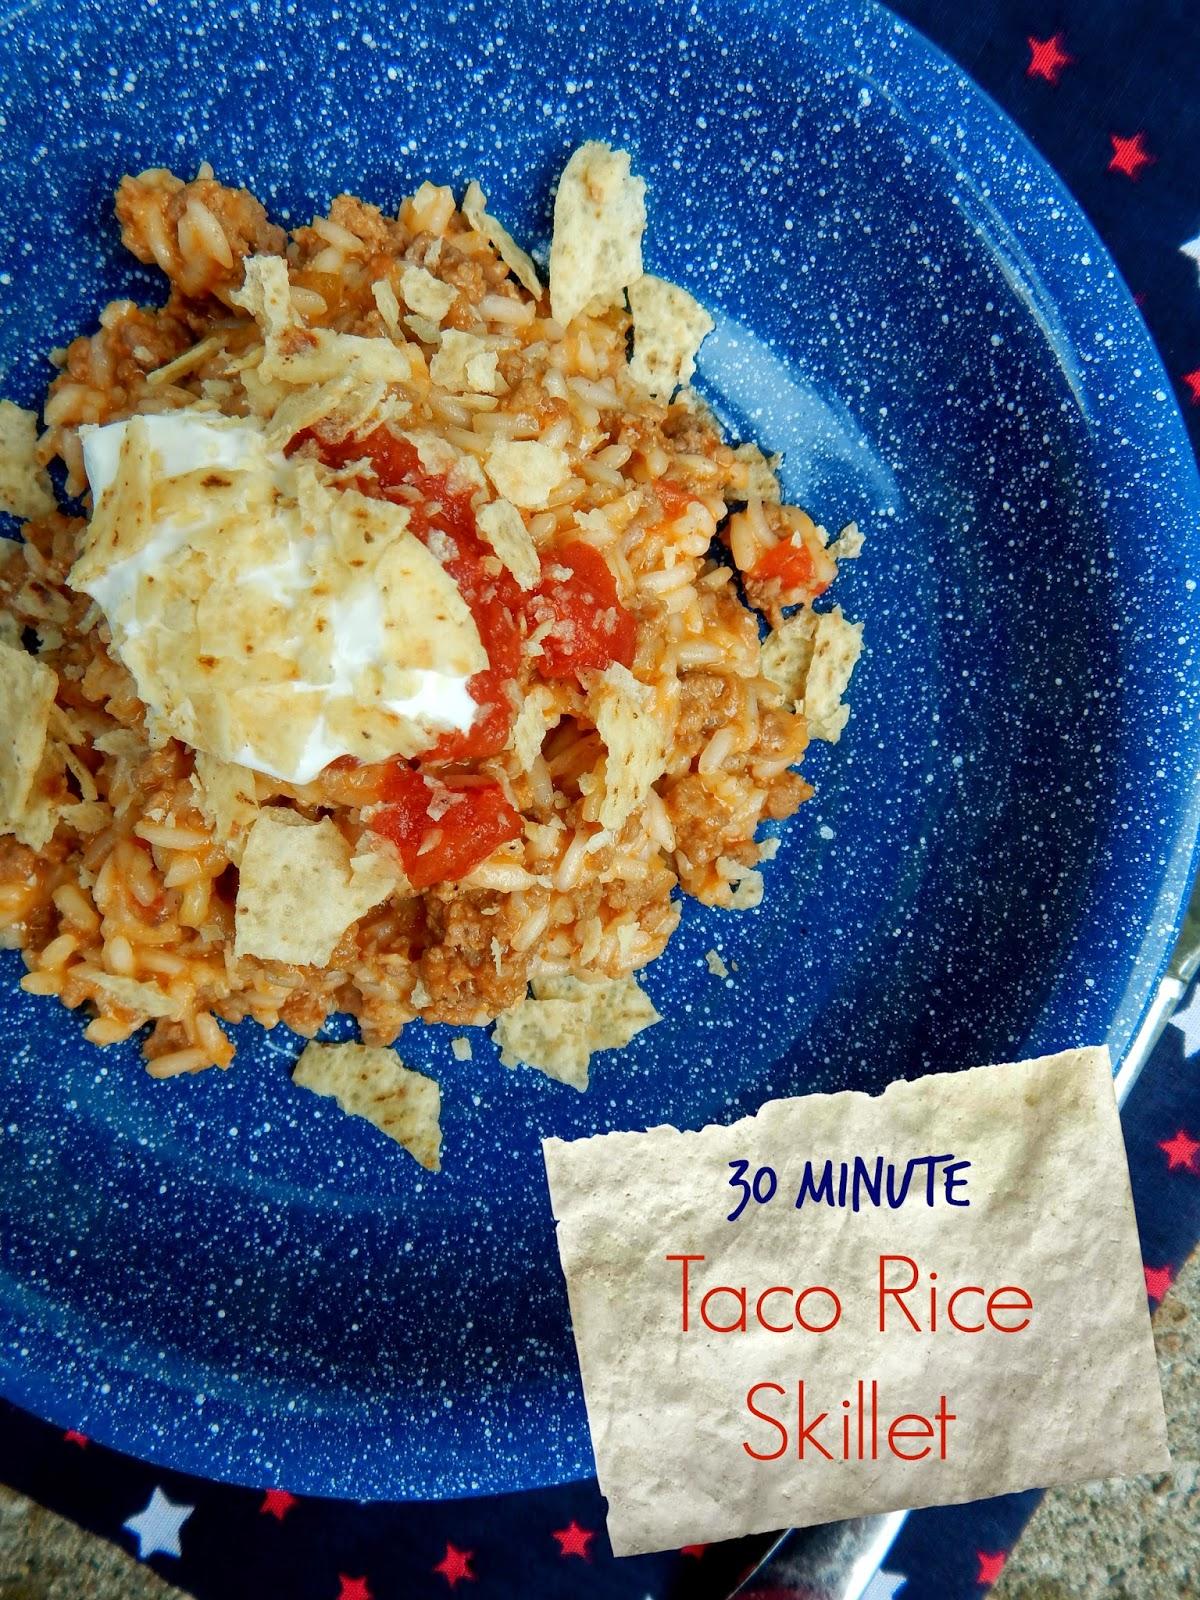 30-minute taco rice skillet (sweetandsavoryfood.com)